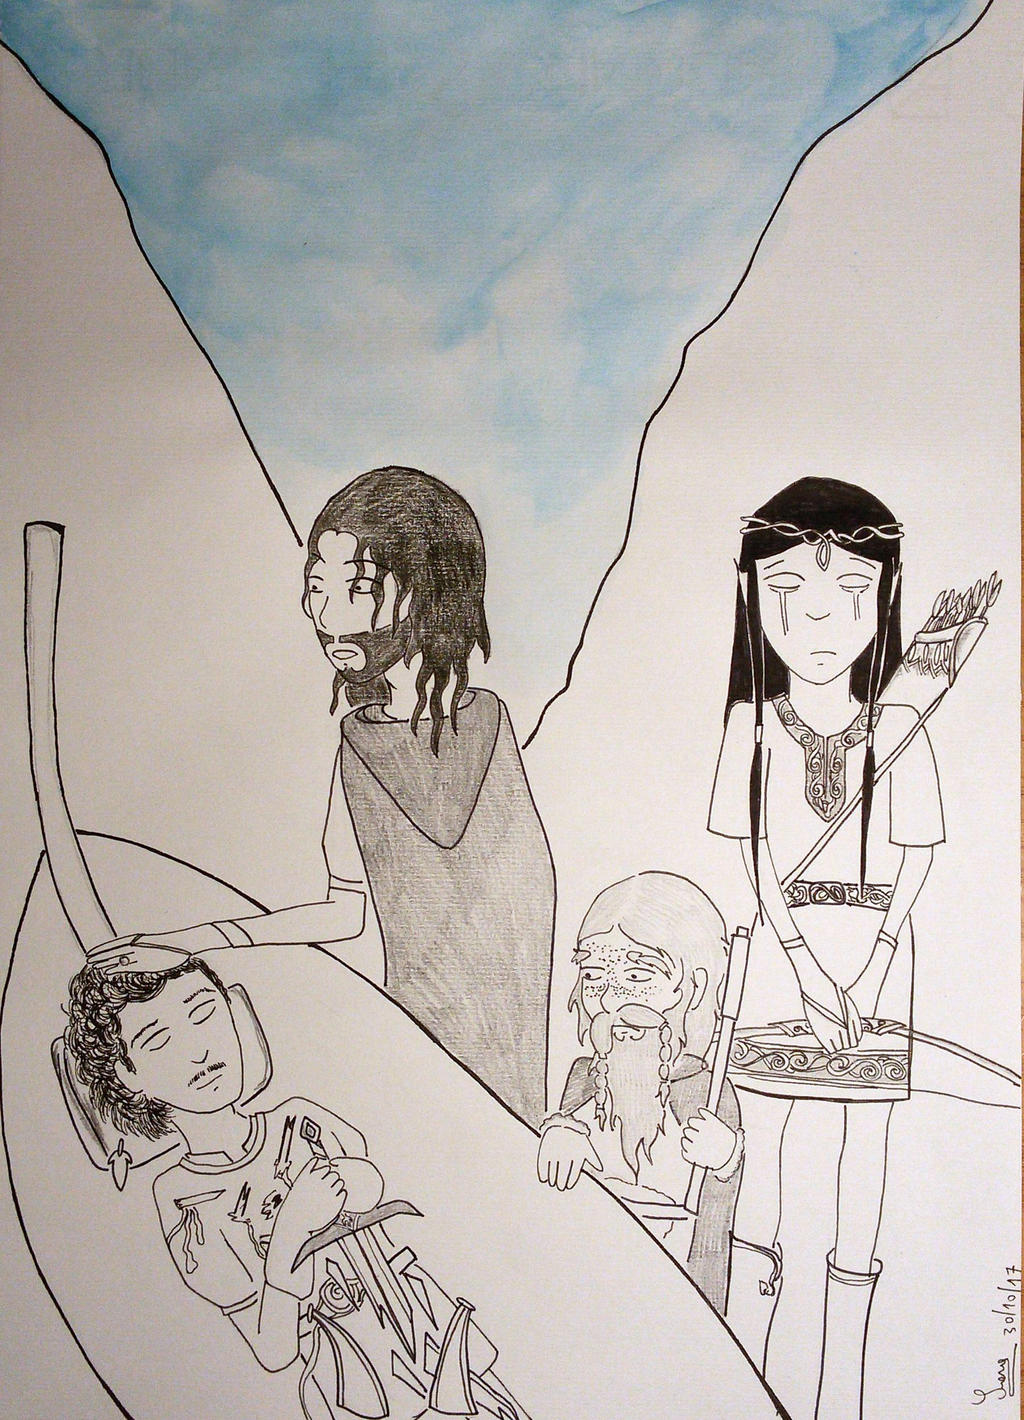 The Departure of Boromir by saramarconato